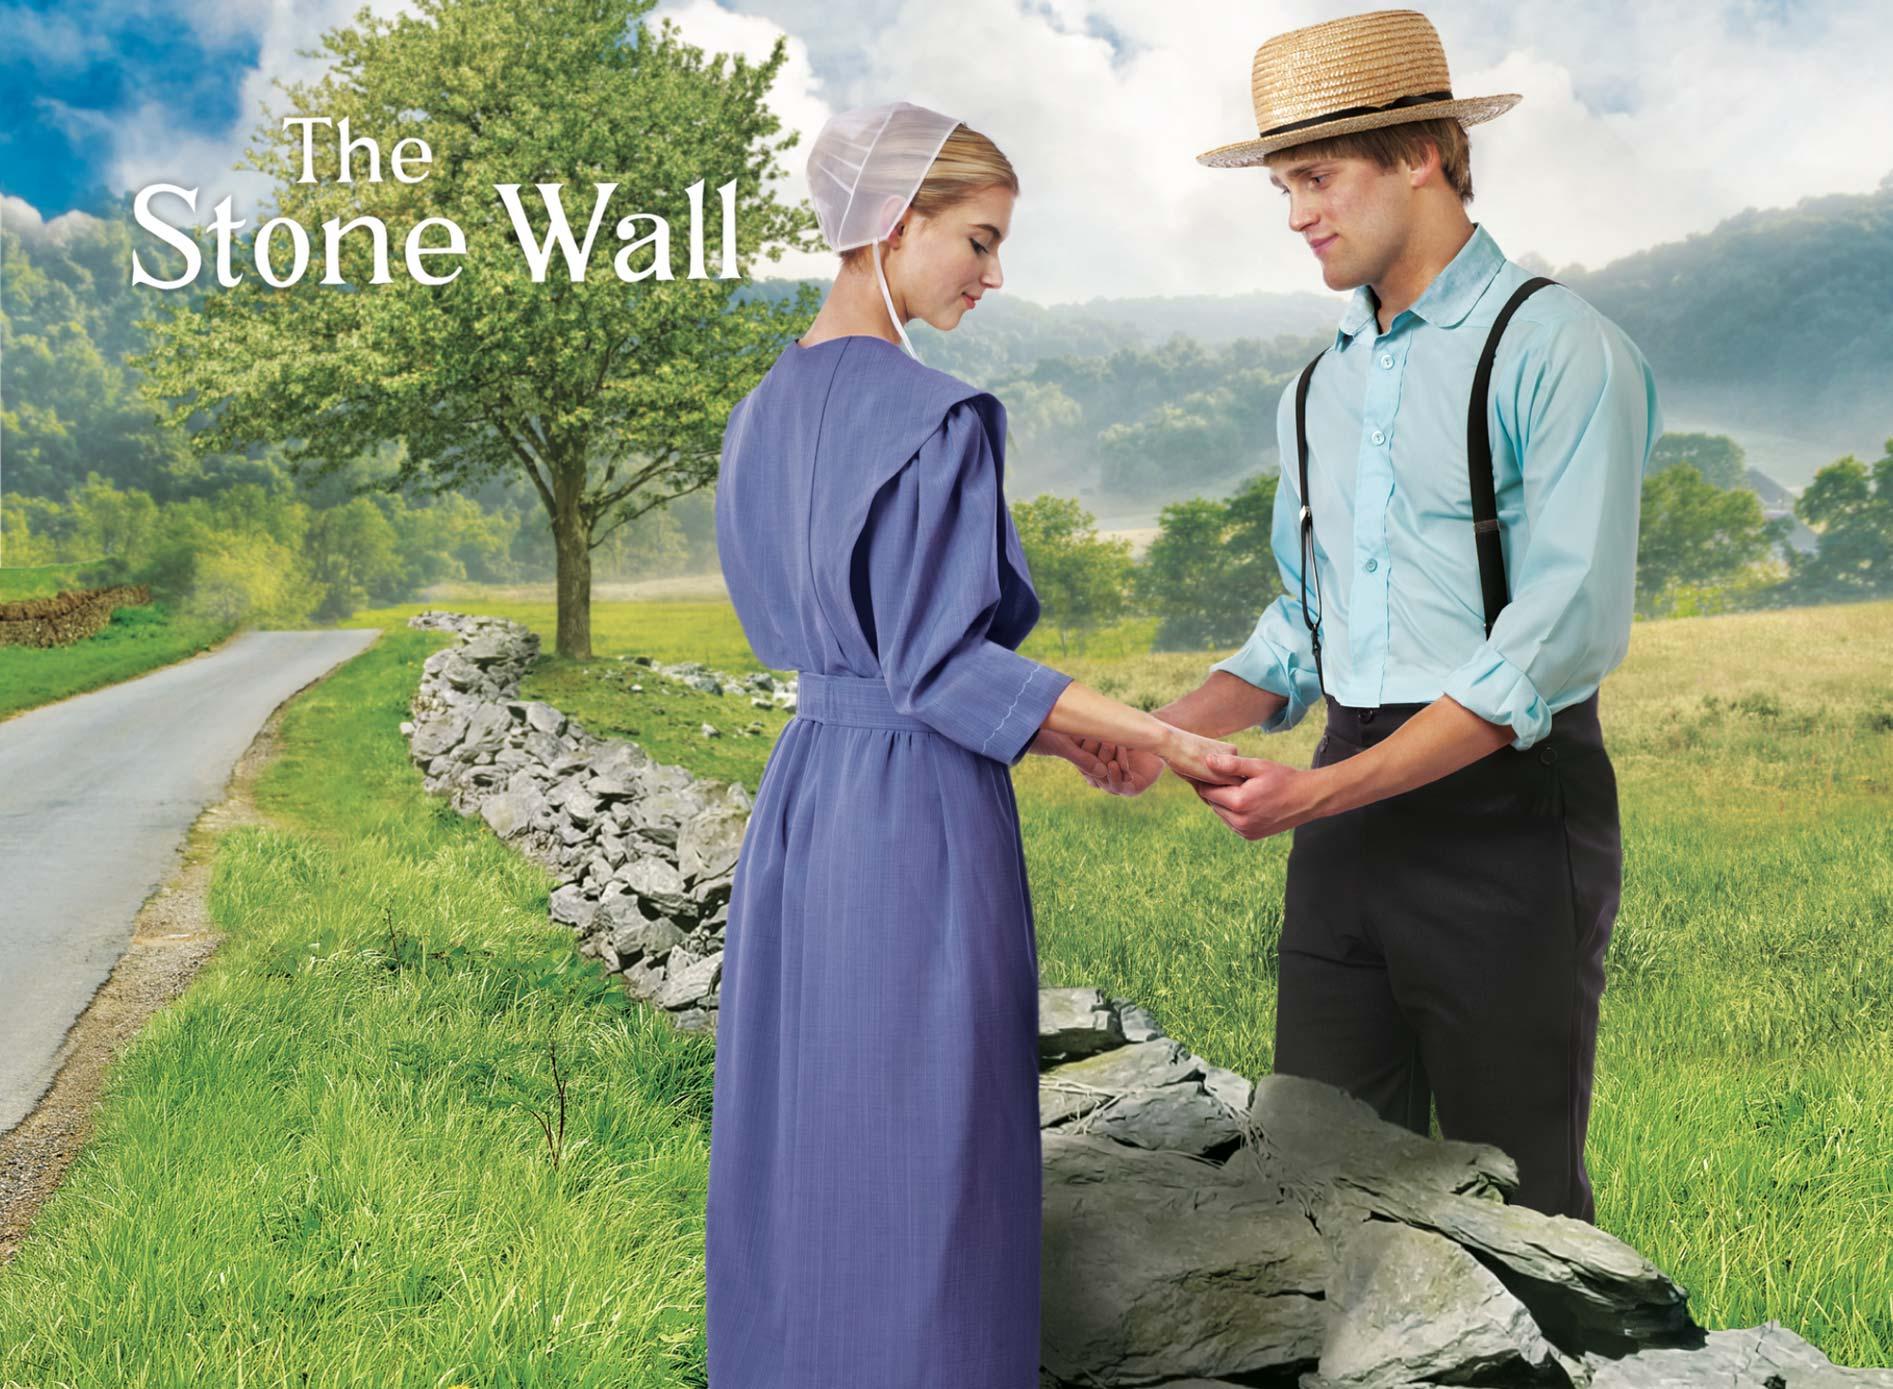 the-stone-wall-header